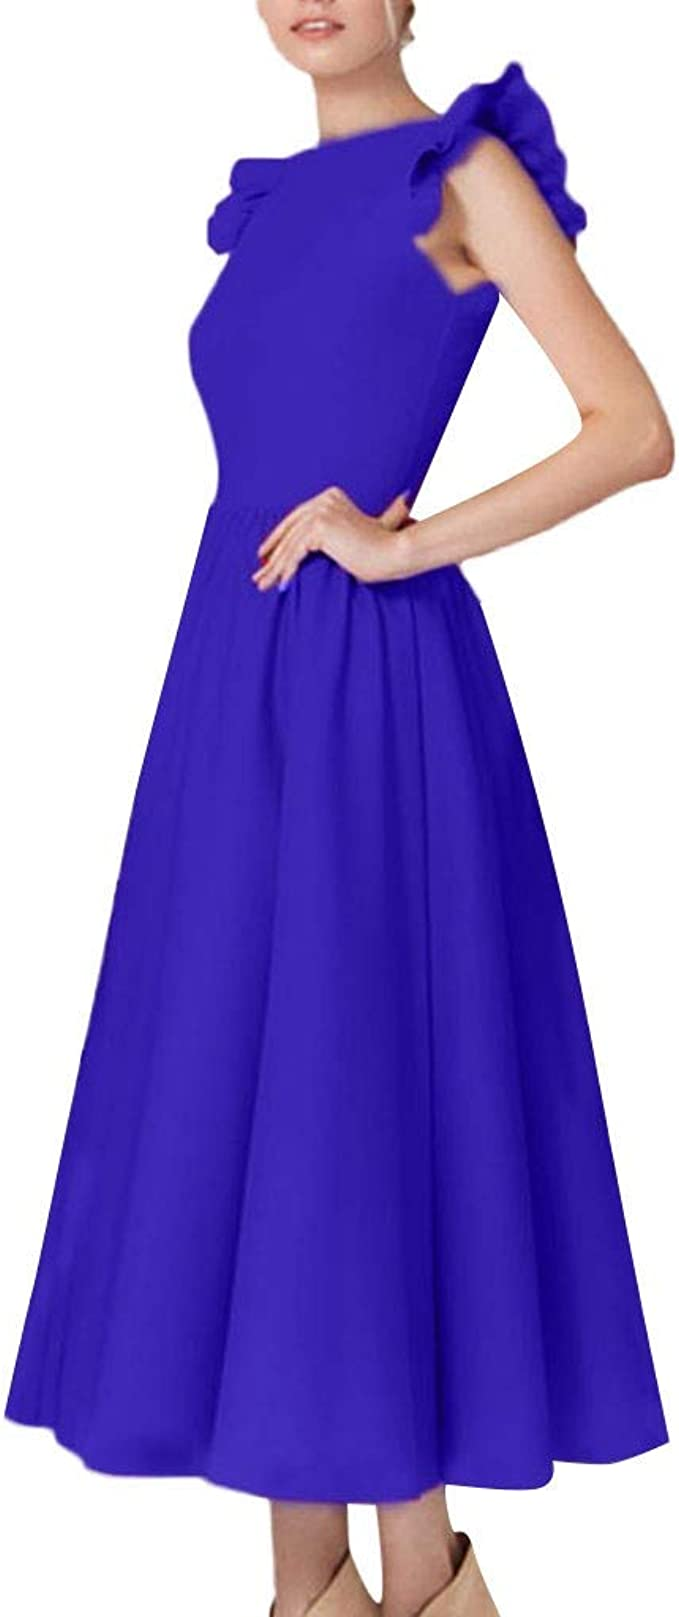 Lulupi 12er Cocktailkleid Vintage Abendkleid Damen Kleider